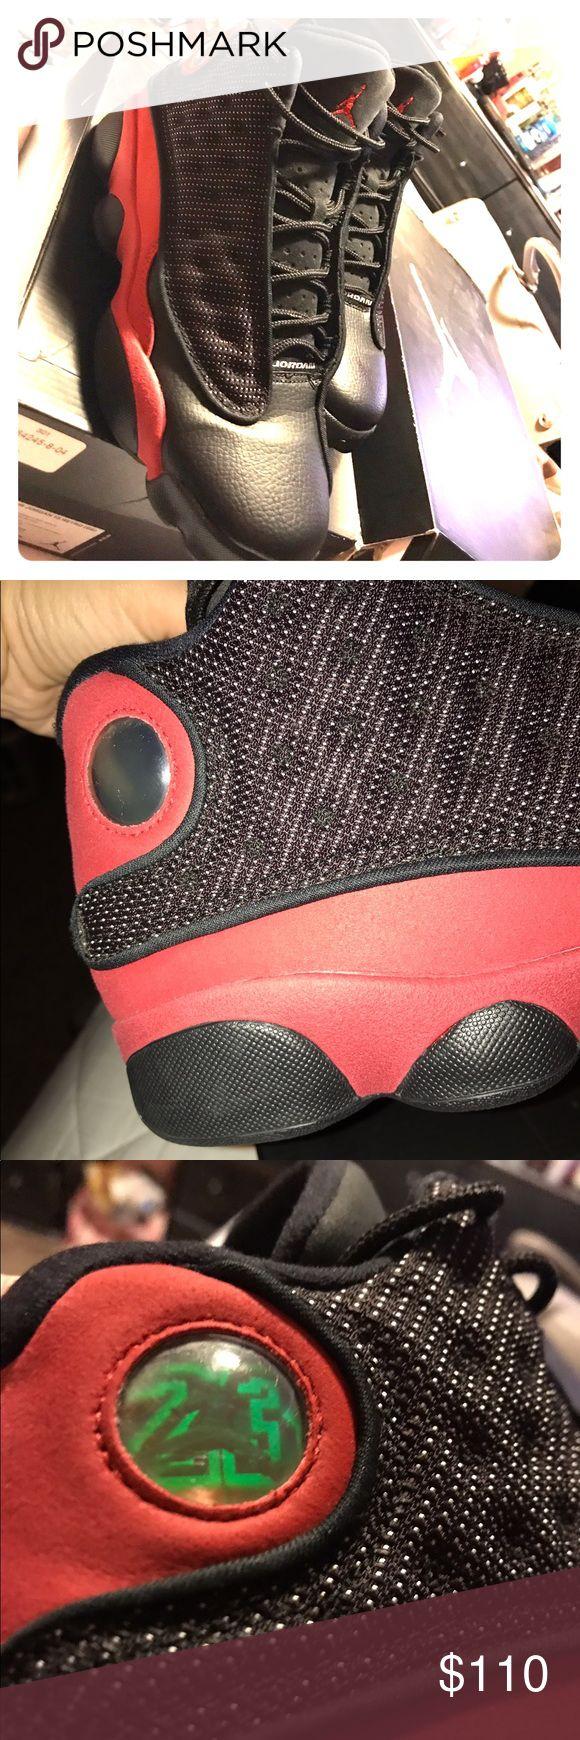 Jordan 13 Breds GS size 6.5 Retro 13 Jordan shoes excellent condition no major flaws at all Jordan Shoes Sneakers